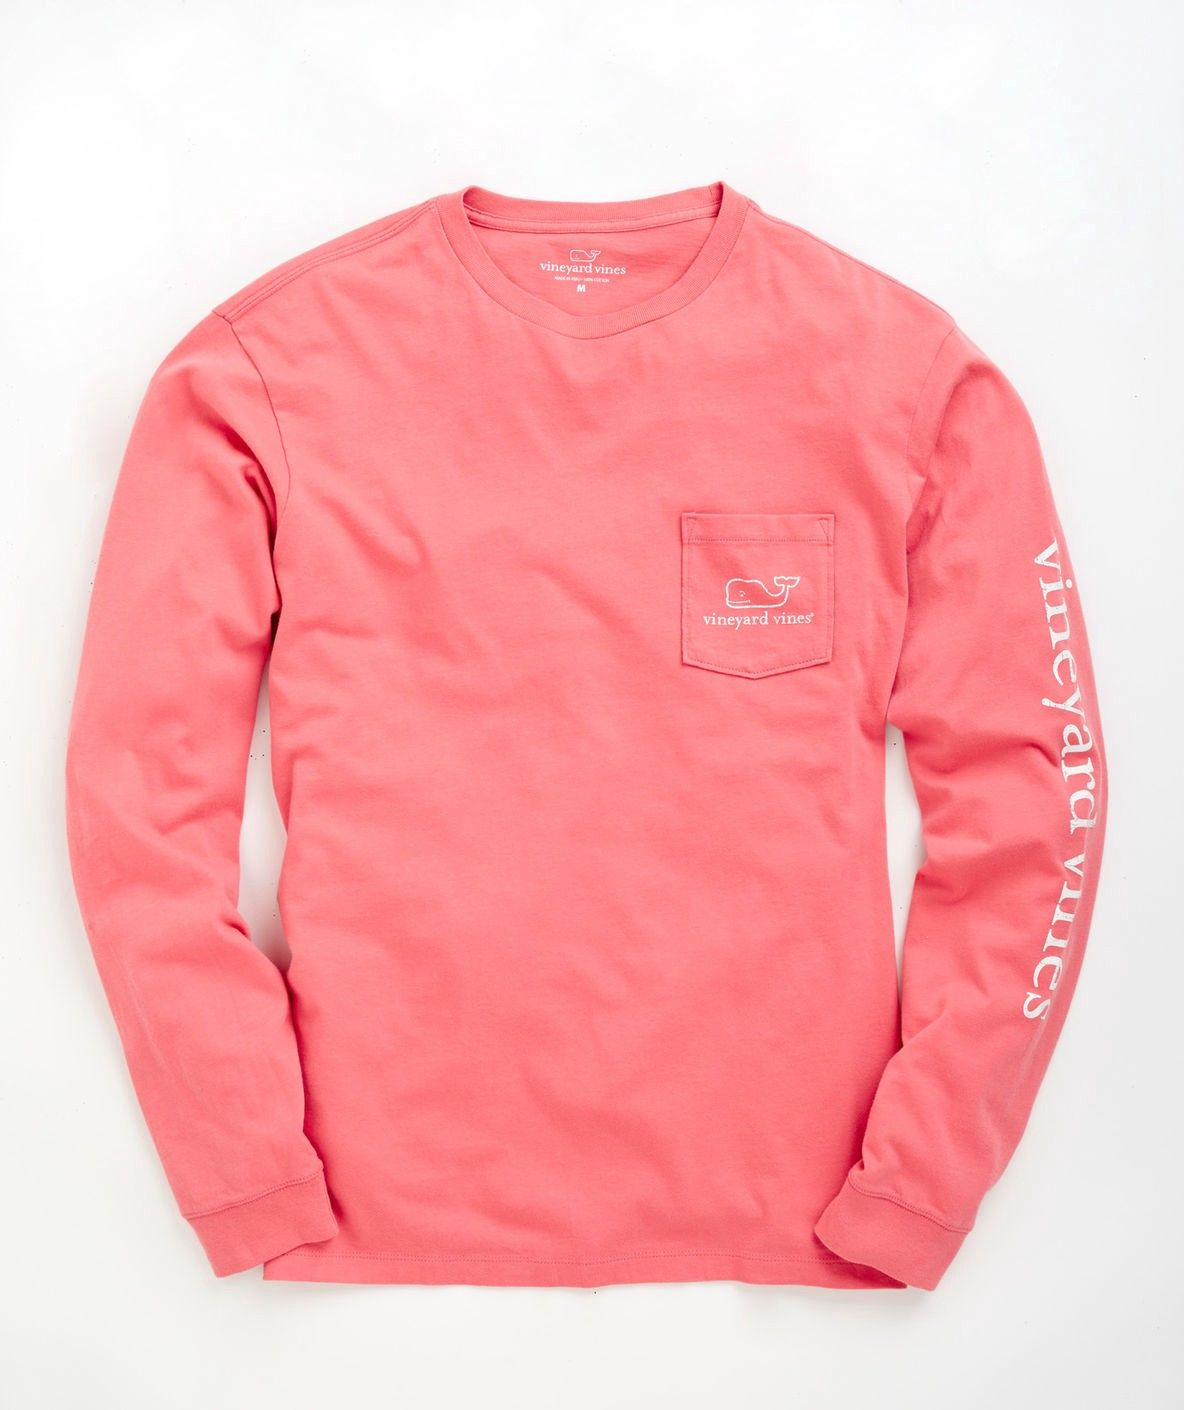 8d7b1412 Vineyard Vines Long-Sleeve Vintage Whale Graphic Pocket T-Shirt - Maui Blue  Xxl